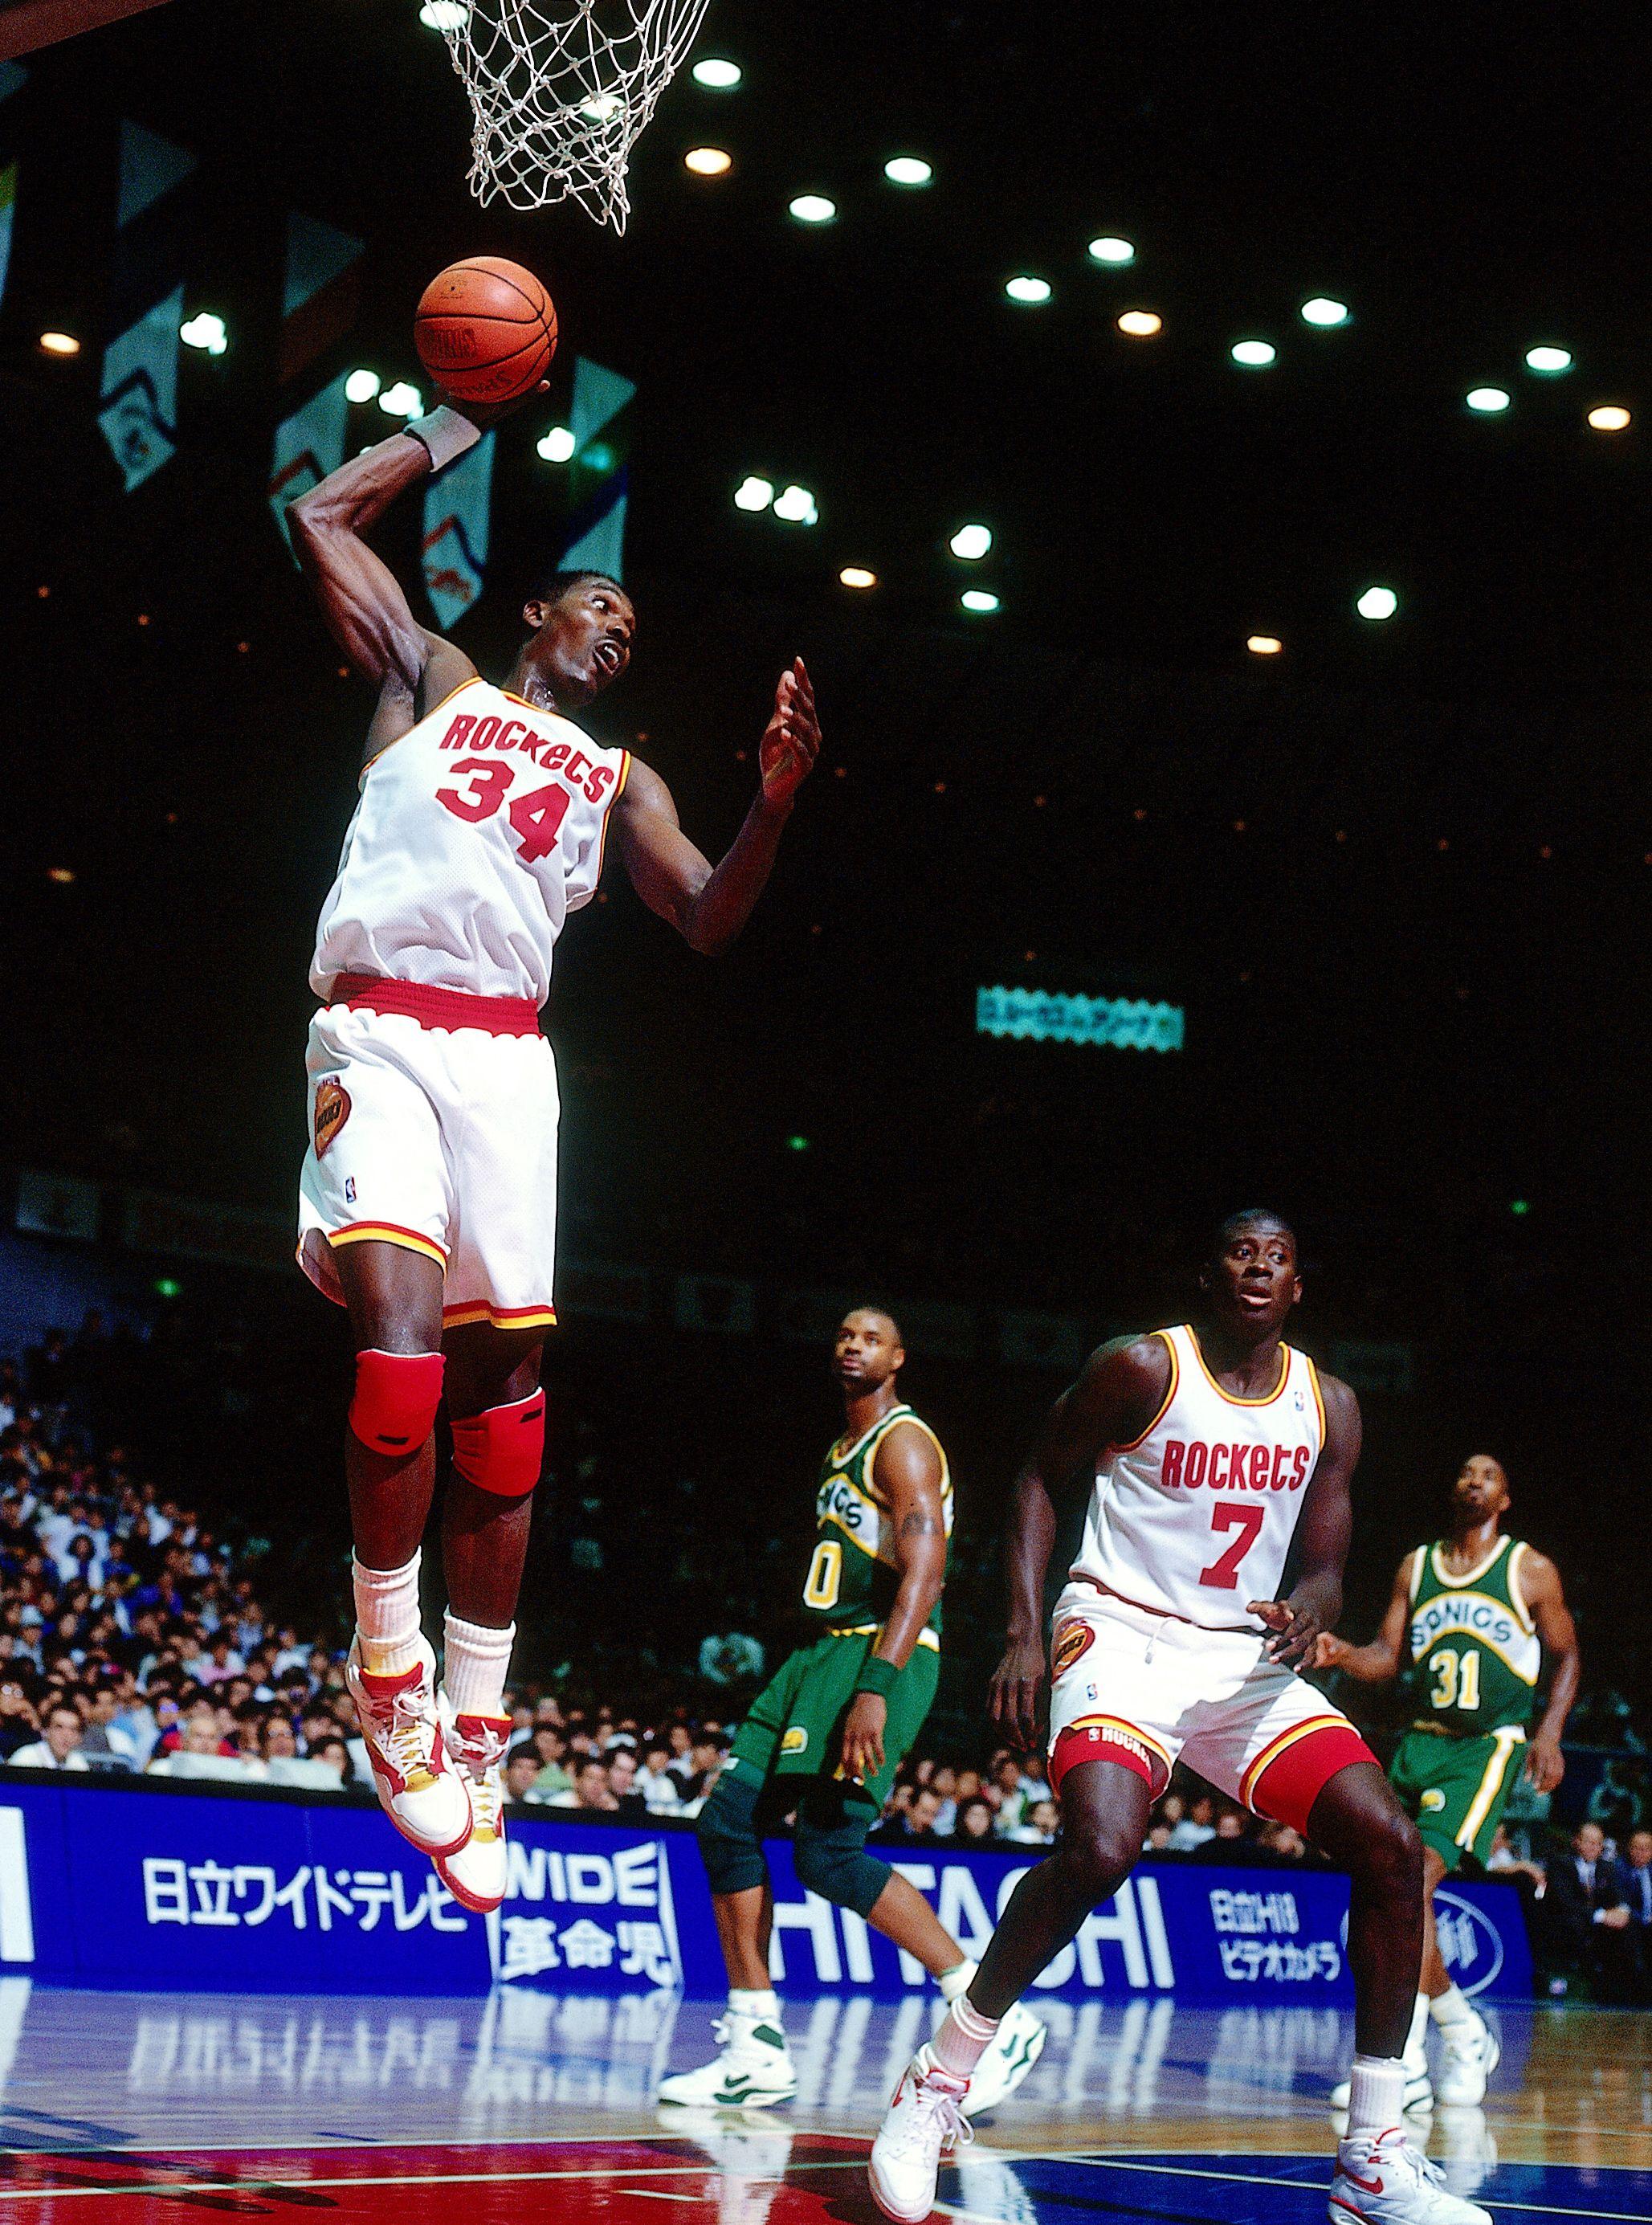 5. Hakeem Olajuwon - Photos: Greatest NBA centers of all time - ESPN